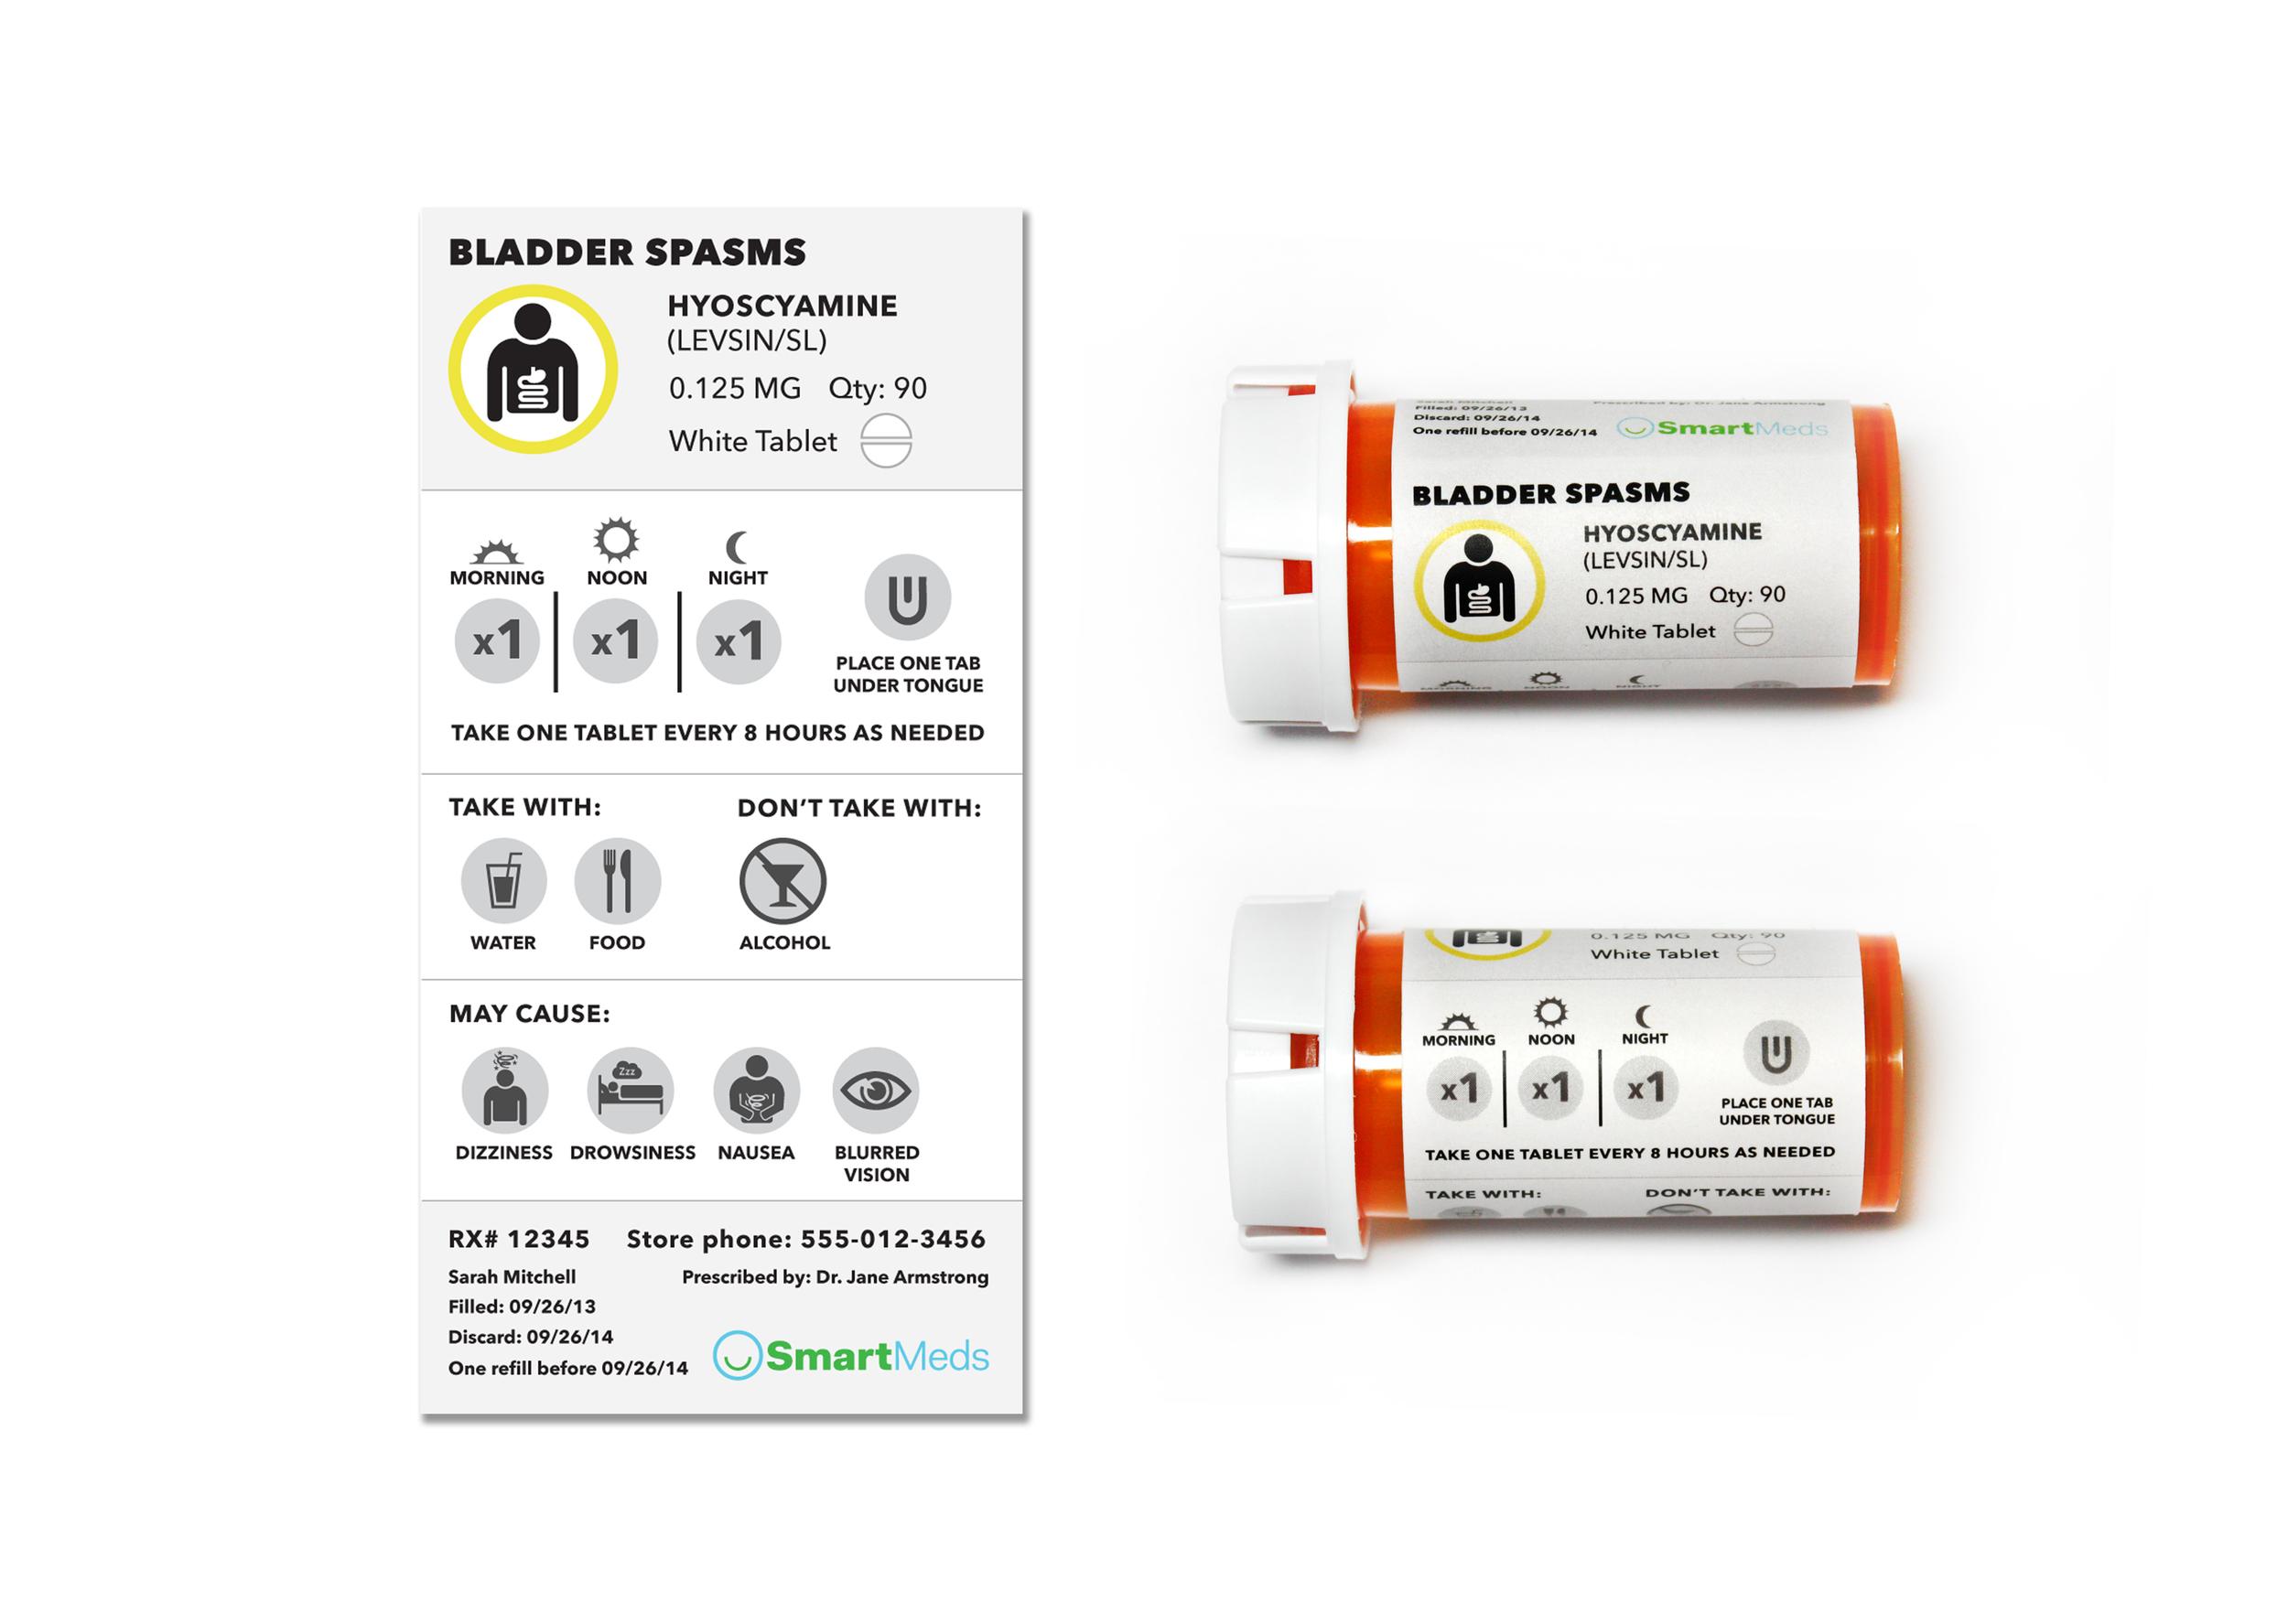 Redesigned pill bottle label